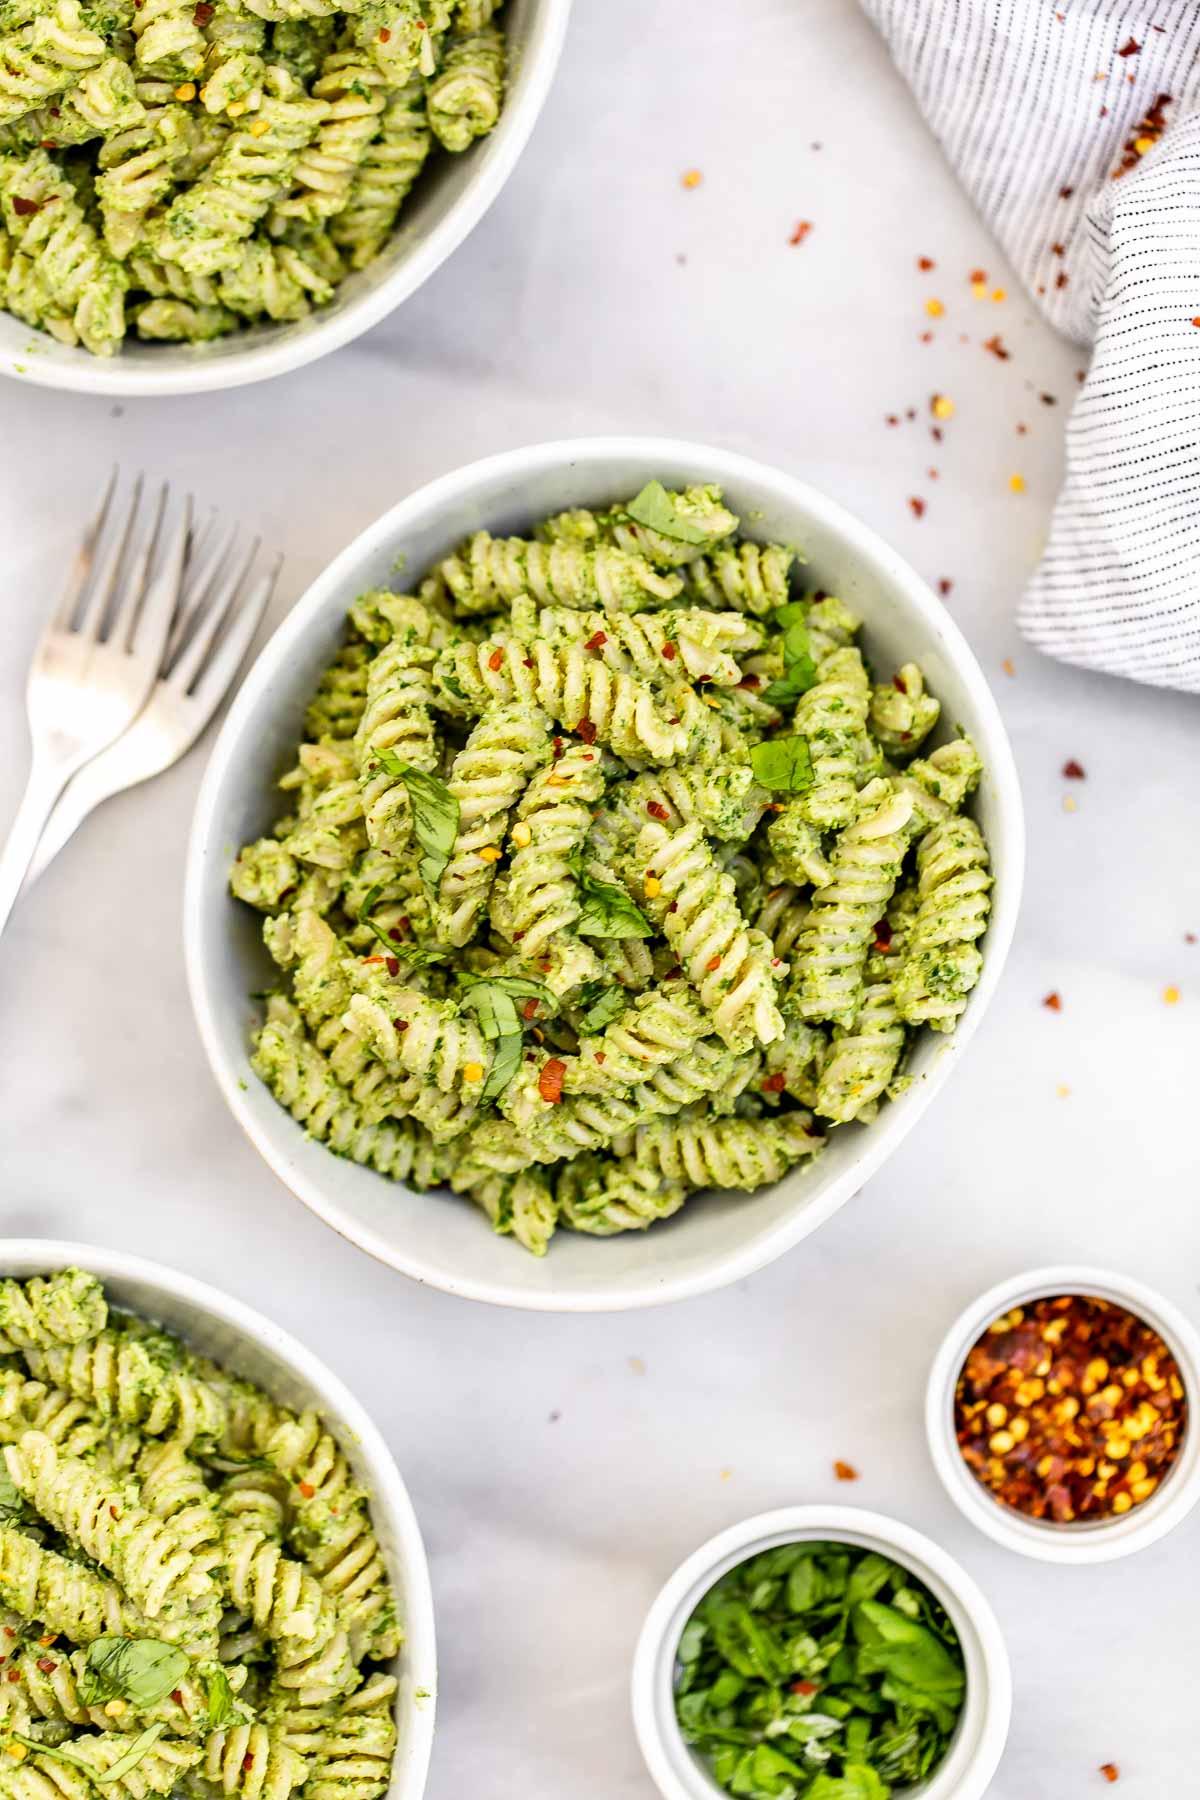 Vegan nut free pesto pasta with fresh basil in a white bowl.